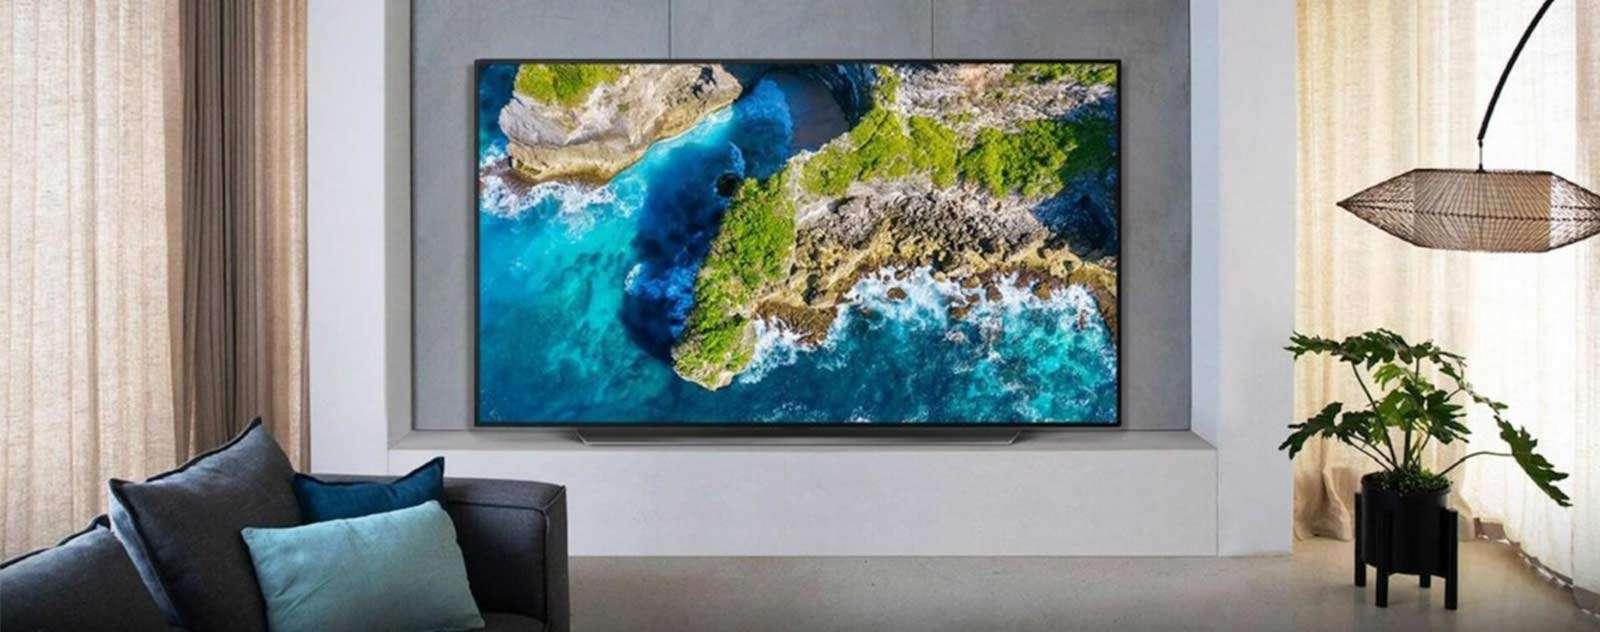 TV Sony - CMC ELECTRICAL APPLIANCES